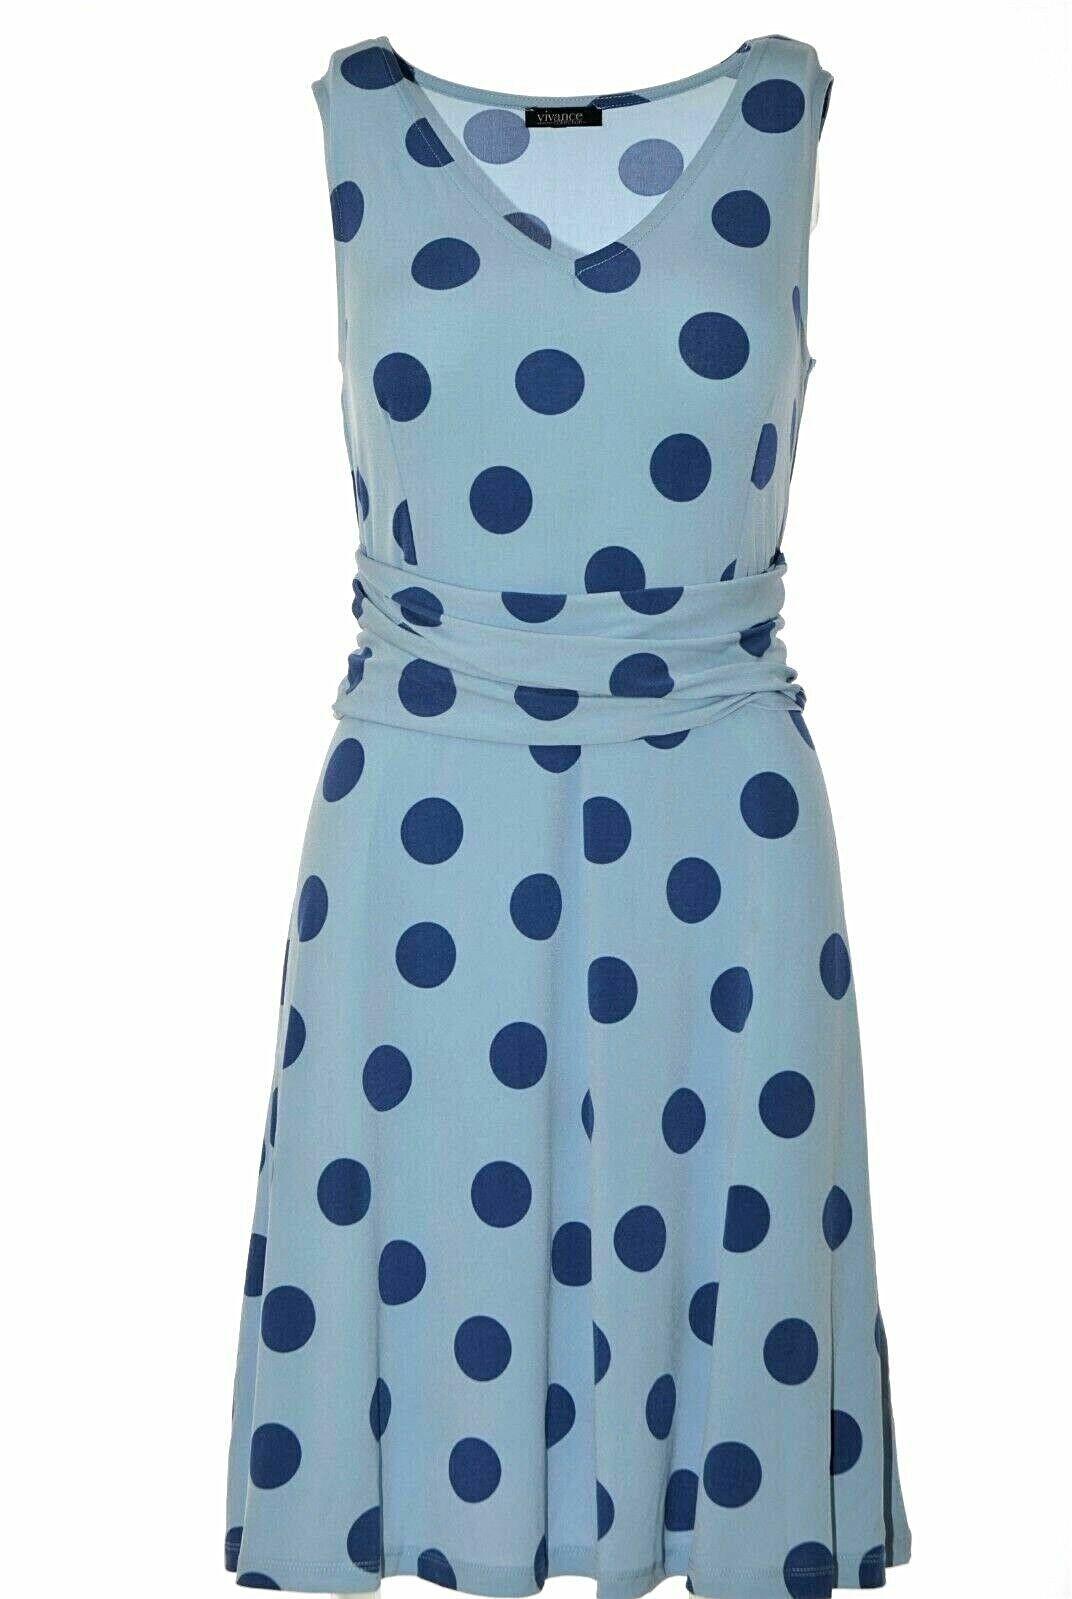 Vivance Damen Kleid A-Linie Sommerkleid DOTS Jerseykleid Hellblau Blau NEU